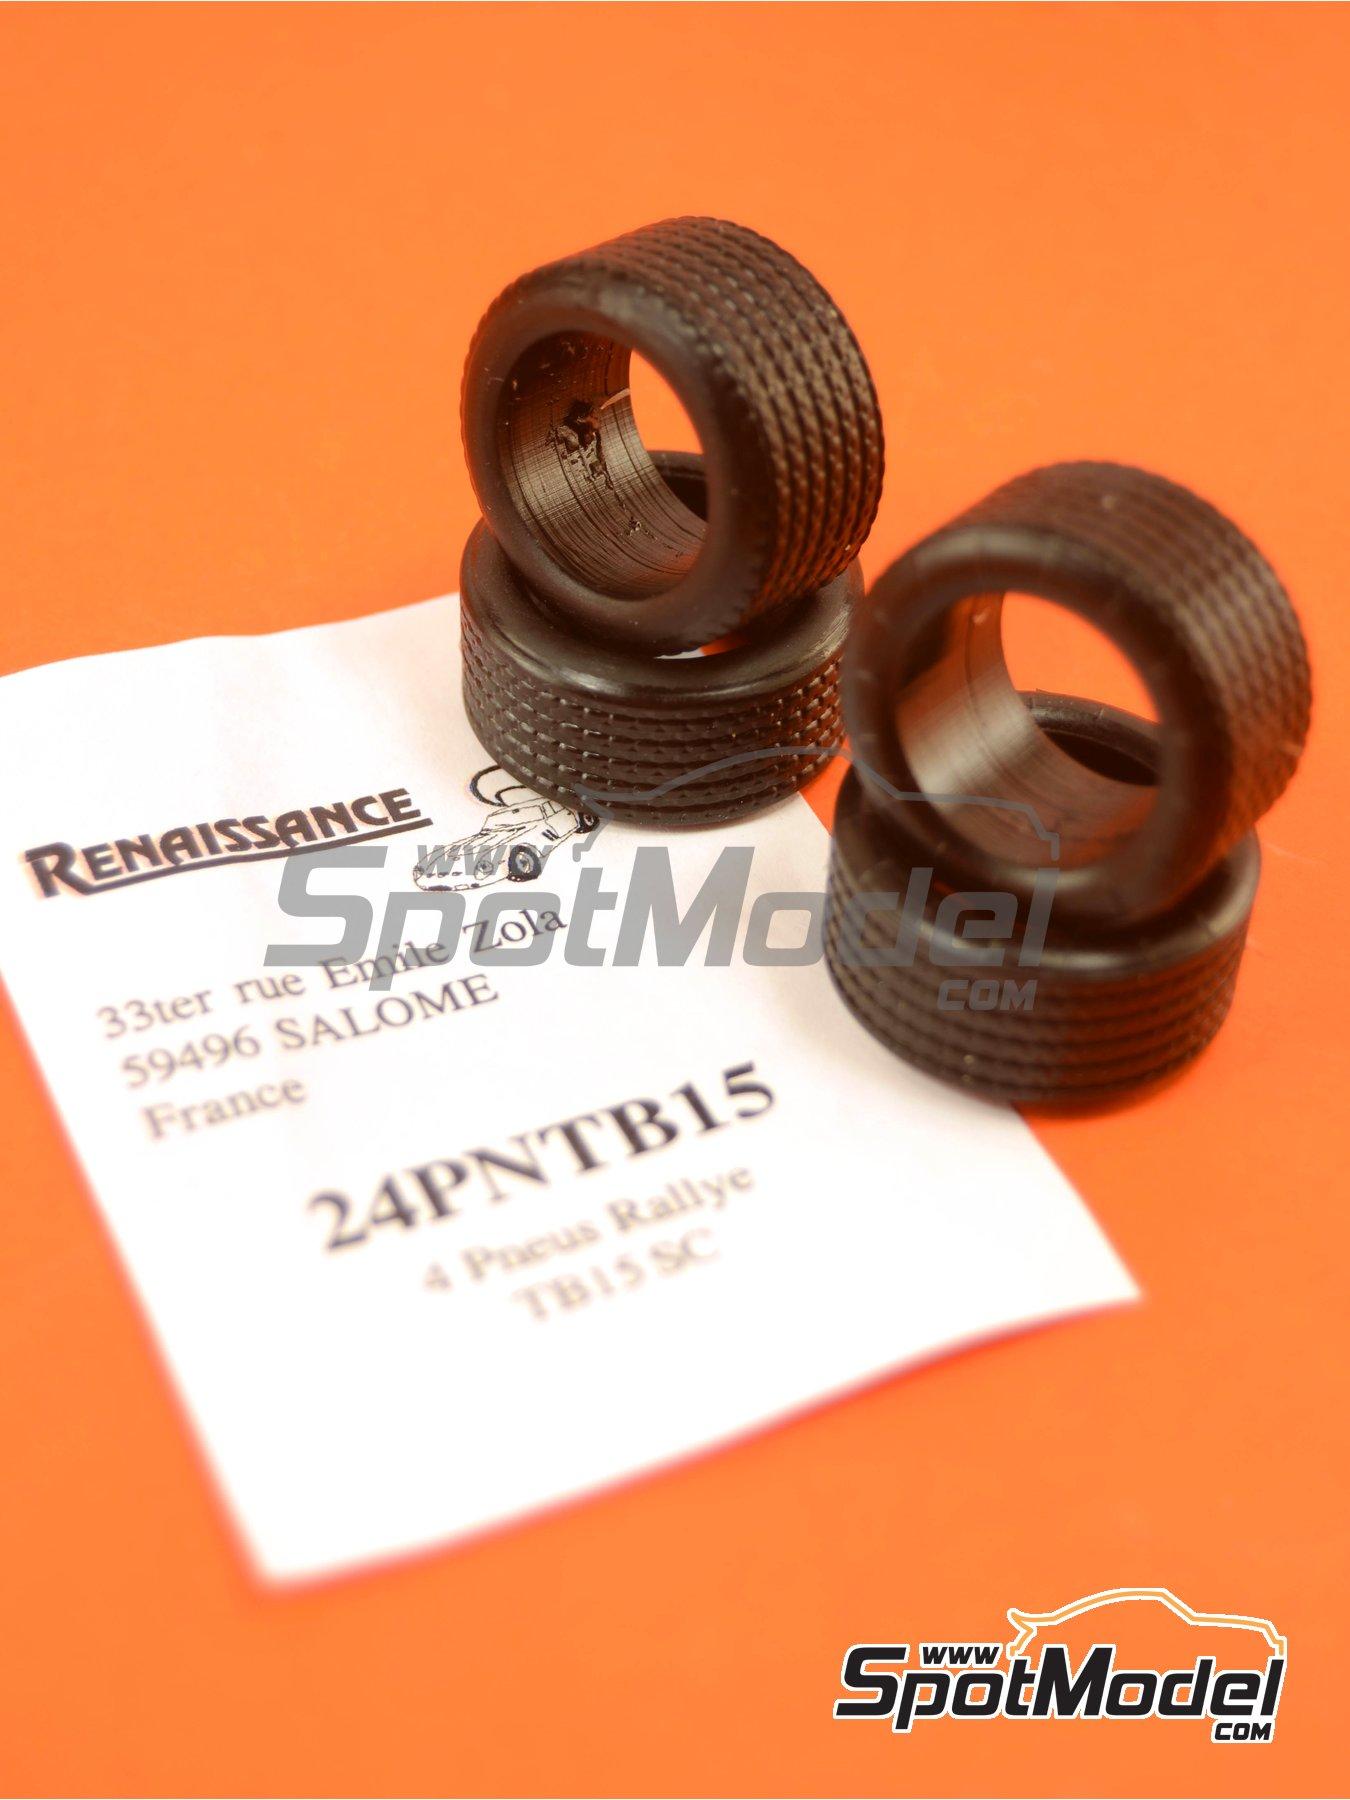 Michelin TB15 rally 15 pulgadas | Neumáticos en escala1/24 fabricado por Renaissance Models (ref.24PNTB15) image